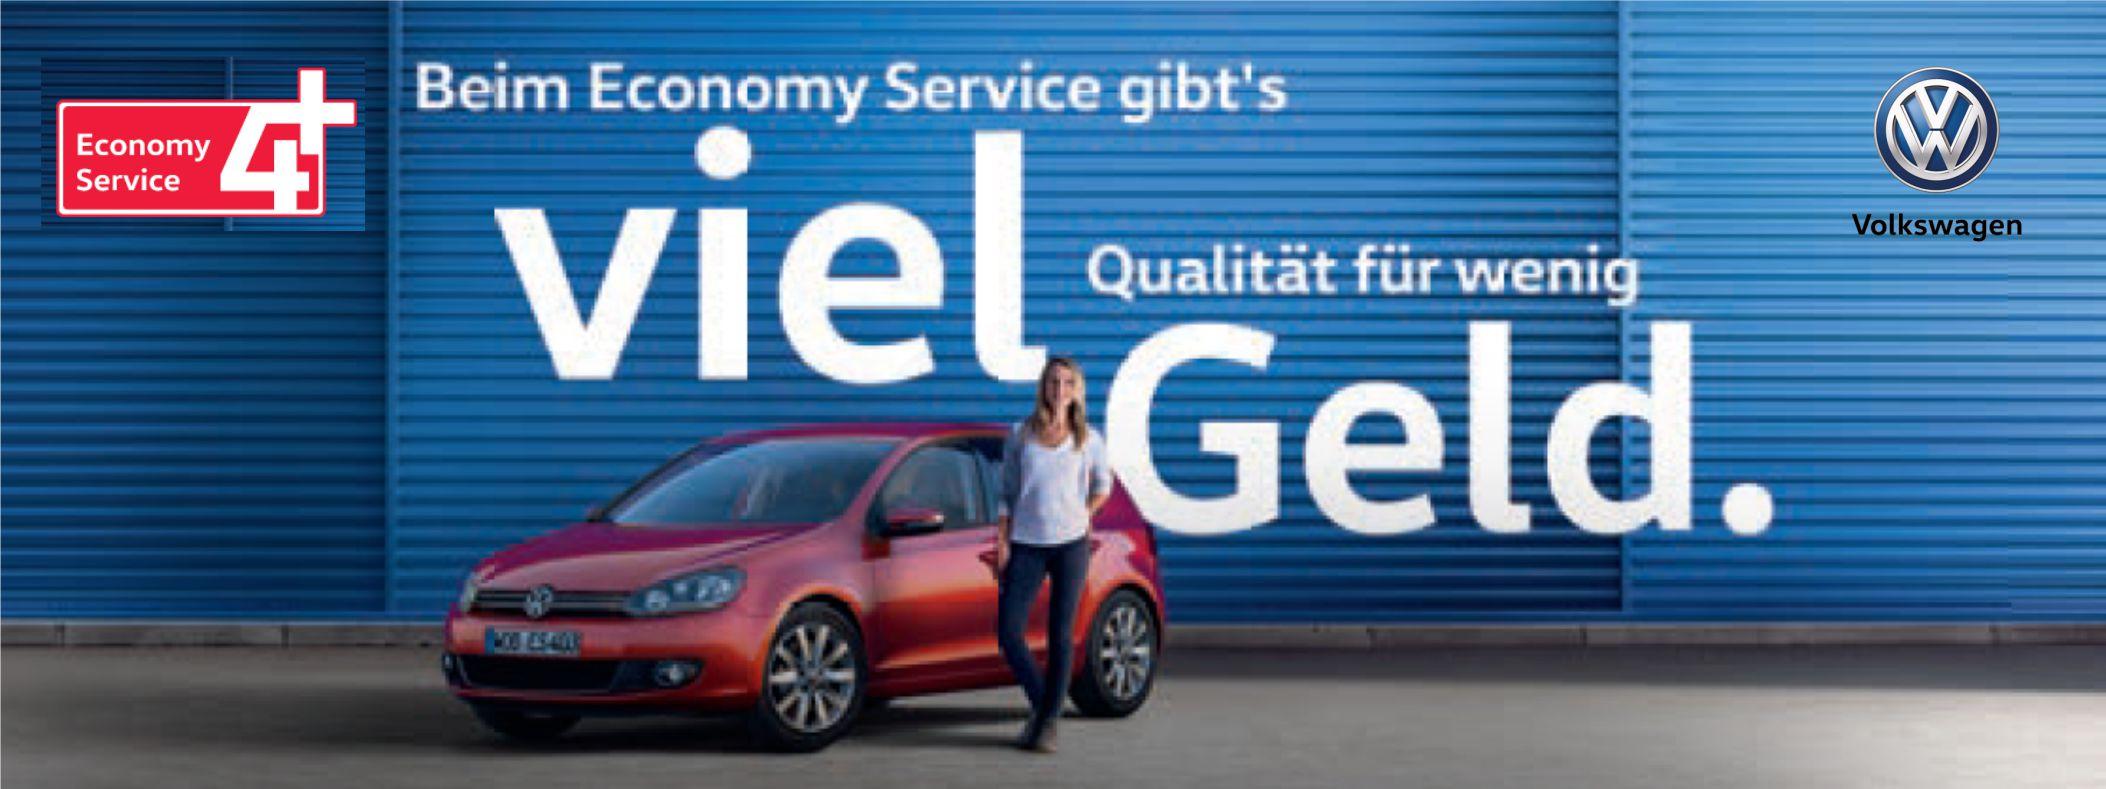 Volkswagen Economy Service Sommer 2019